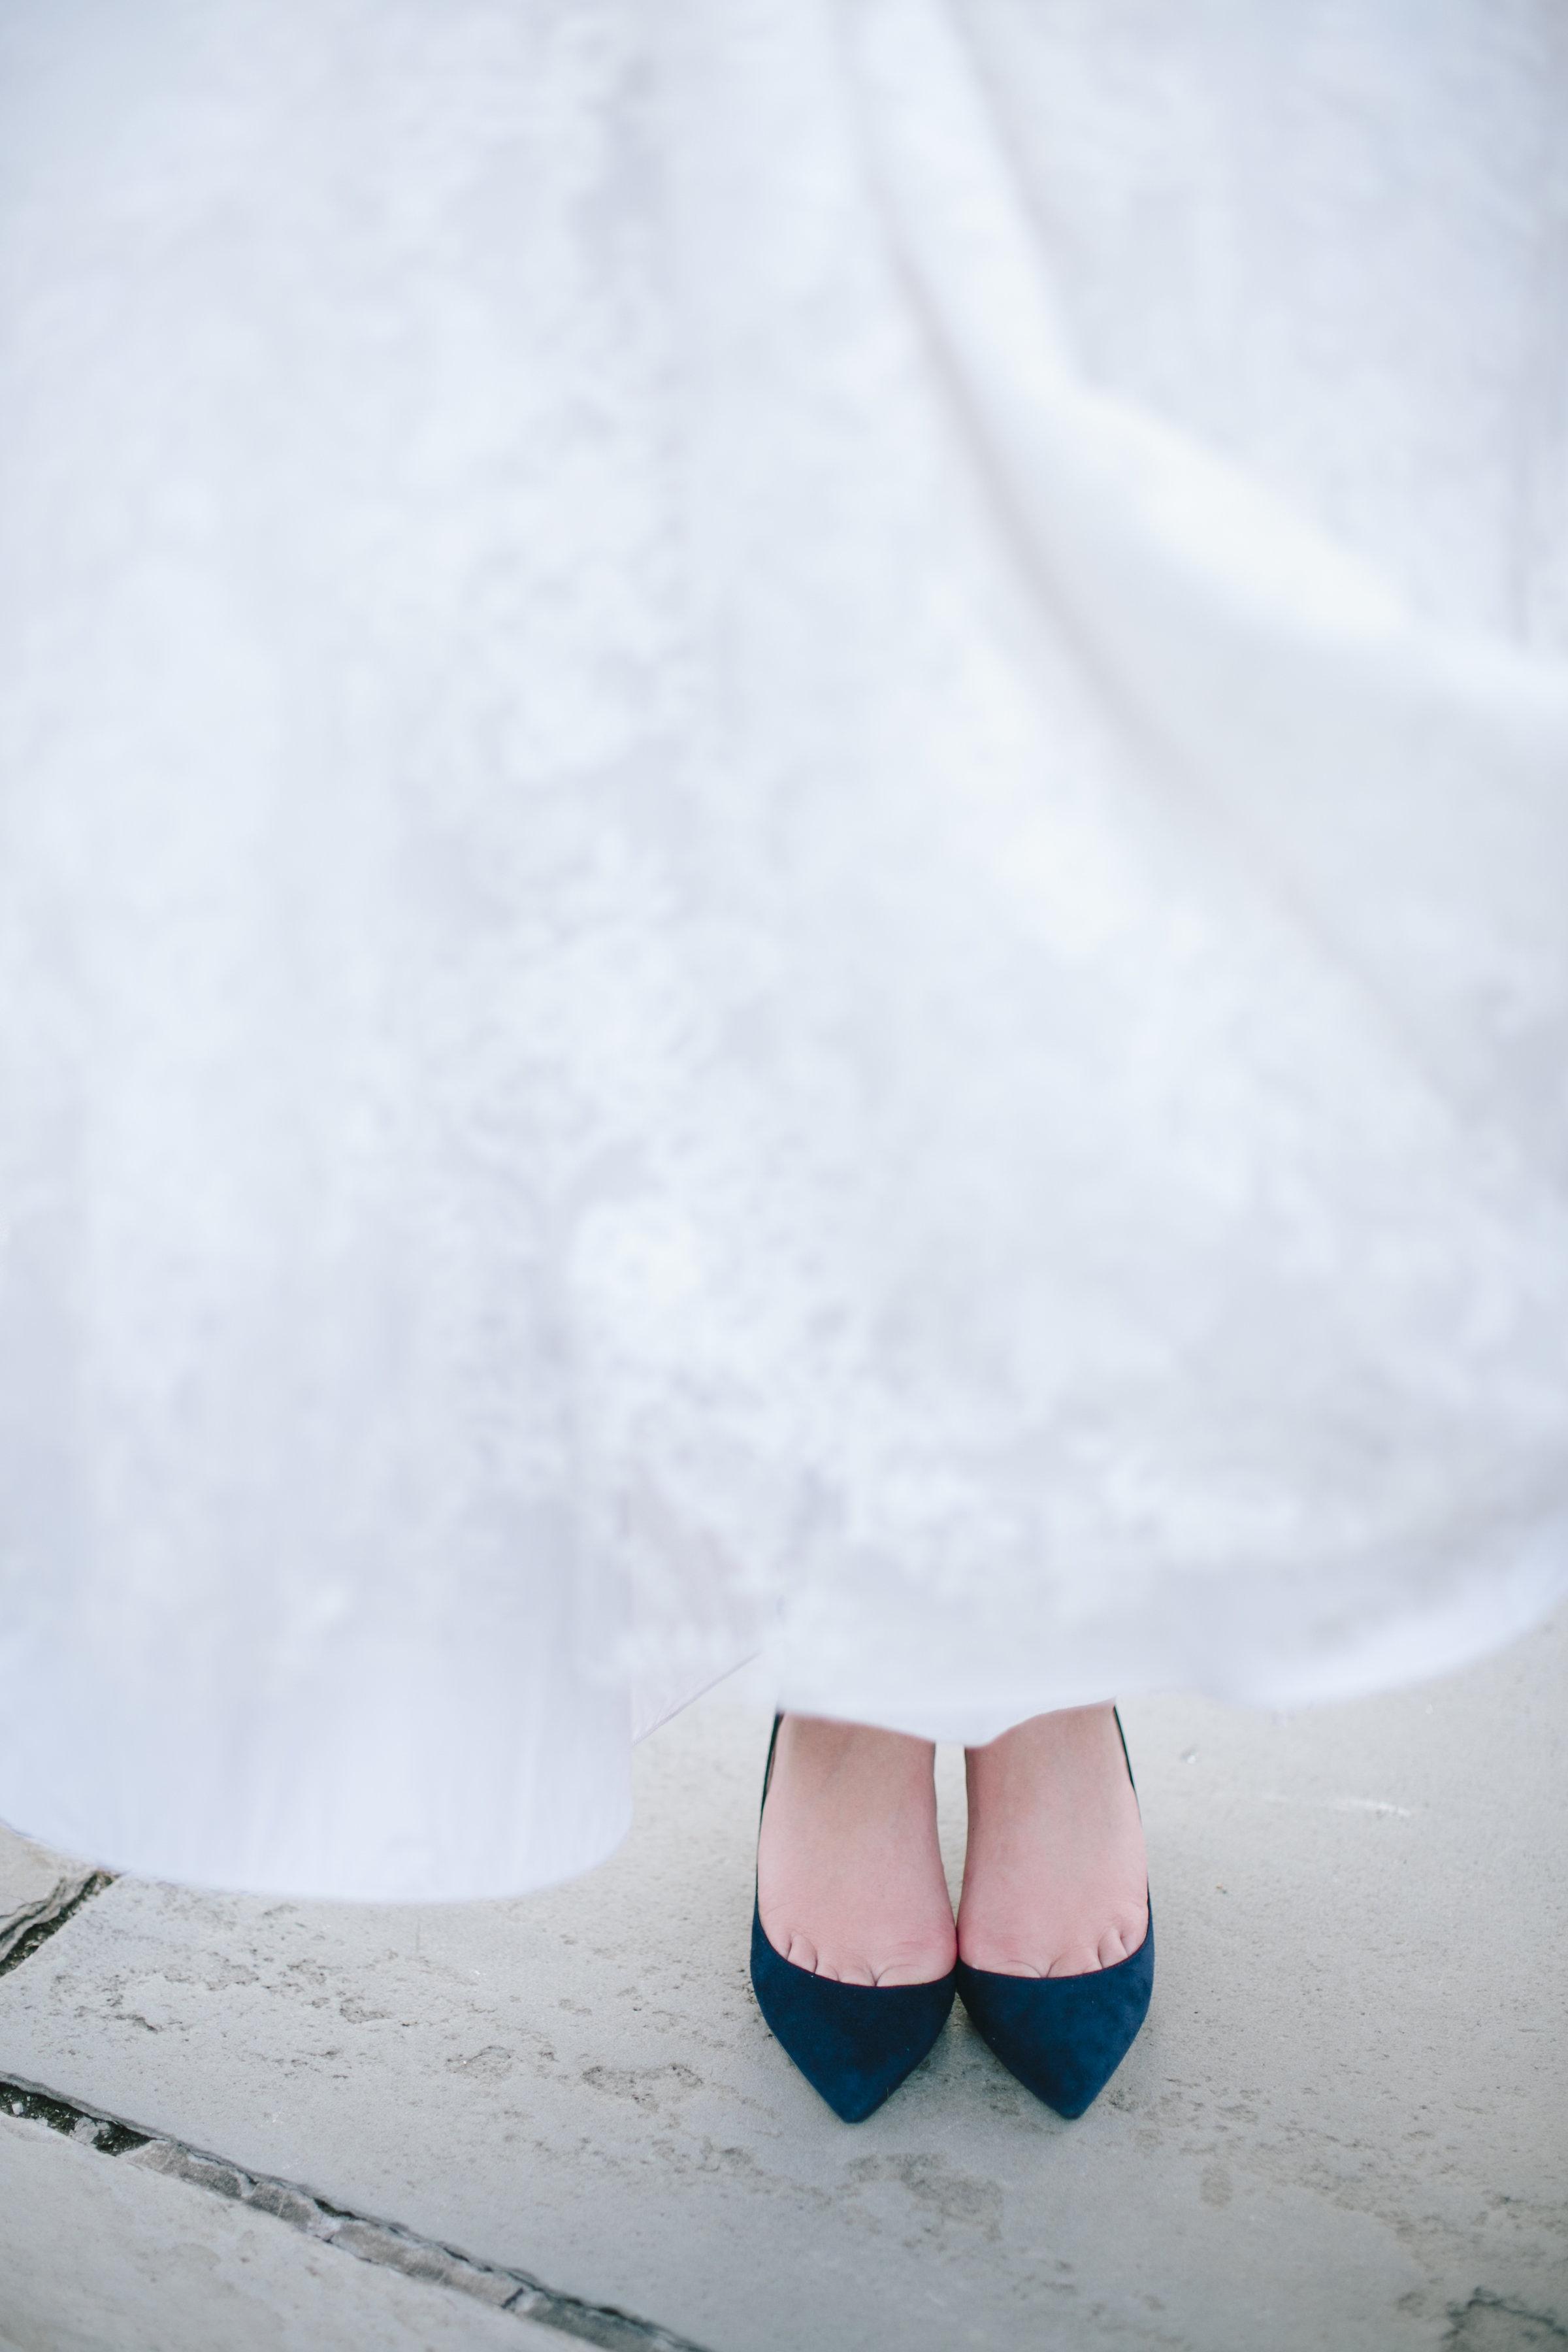 Teal Bridal Shoes.jpg